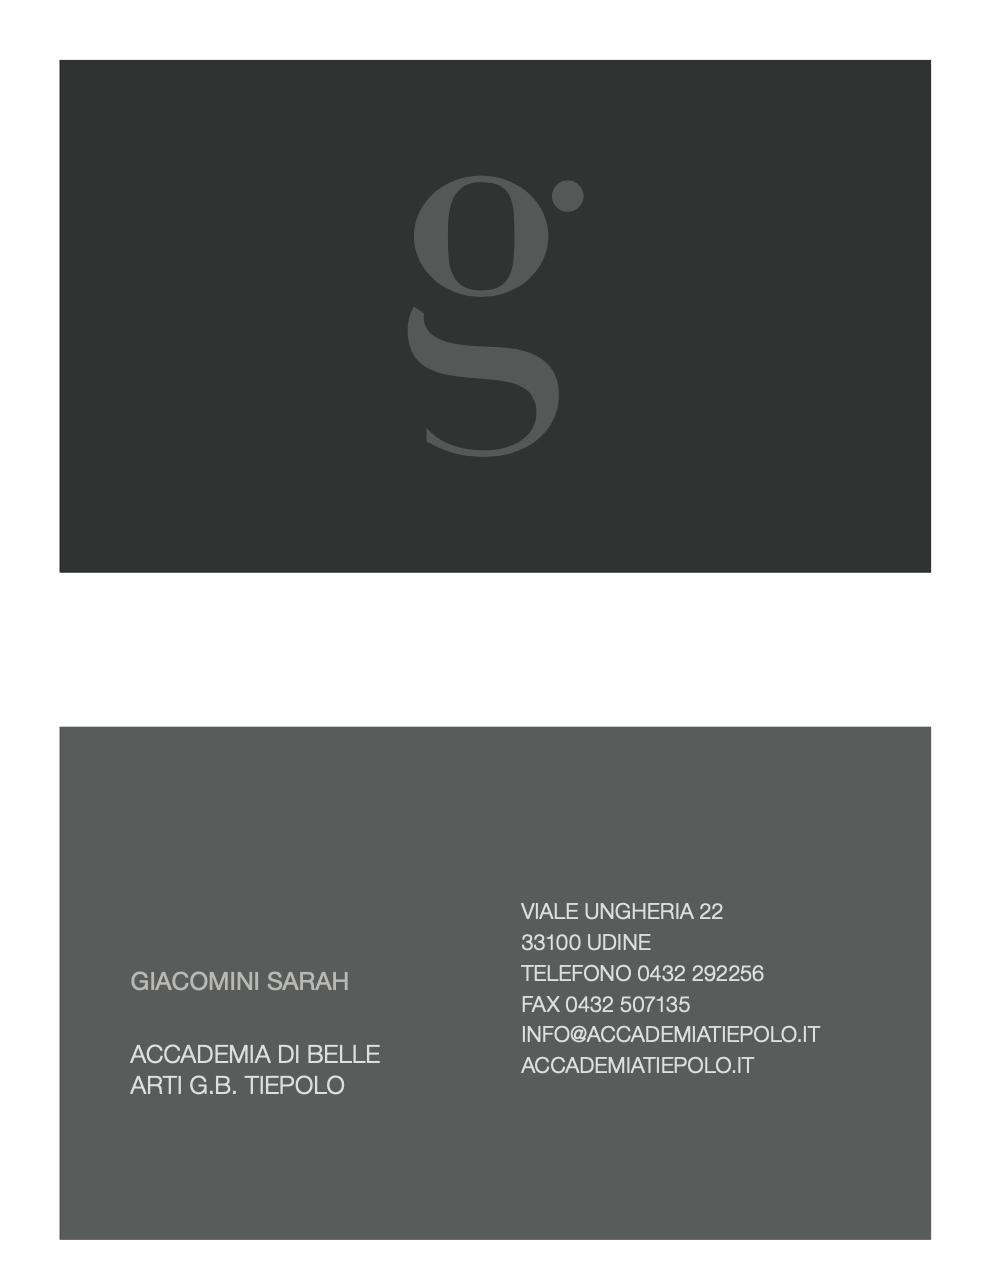 sarah-giacomini-biglietto-visita